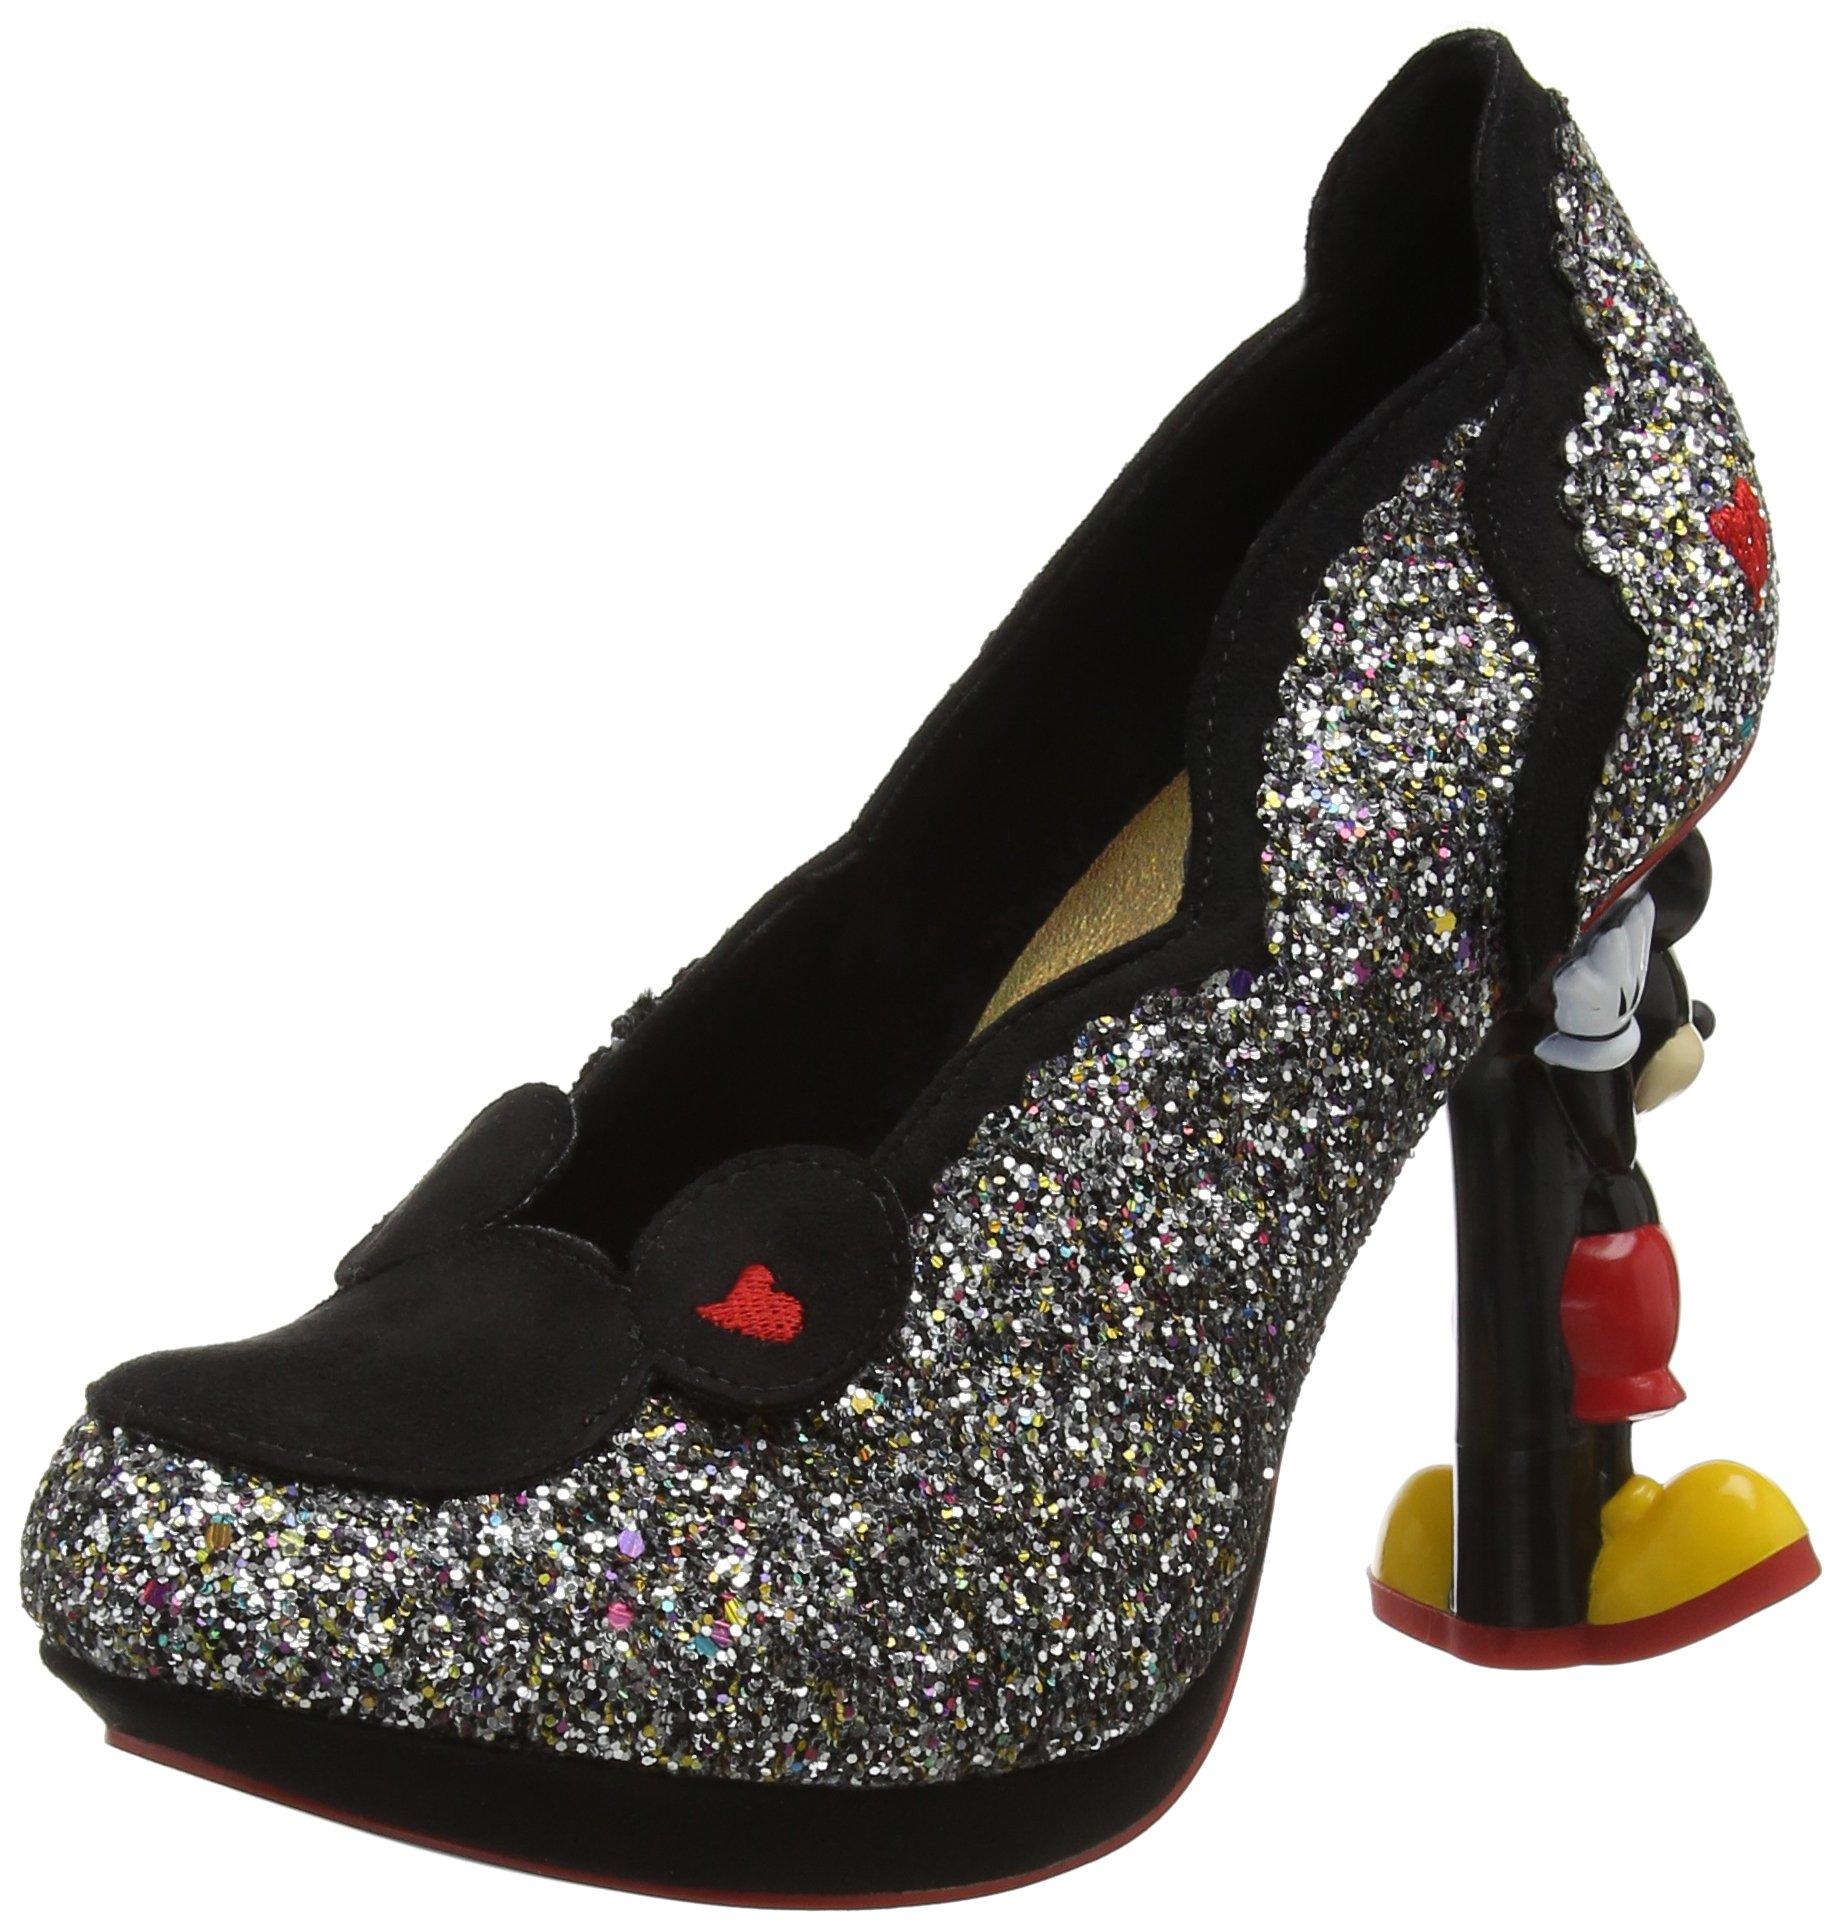 Choice FemmeNoir Minnie MouseEscarpins Irregular Blackblack Glitter40 Multi Yf7yvbg6